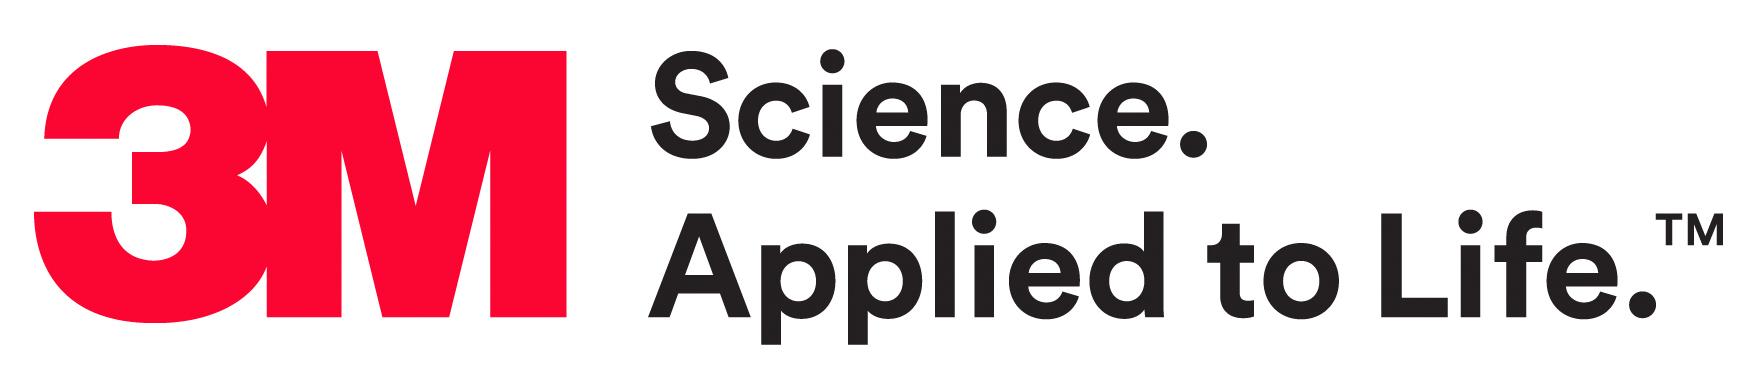 3M logo with motto.jpg